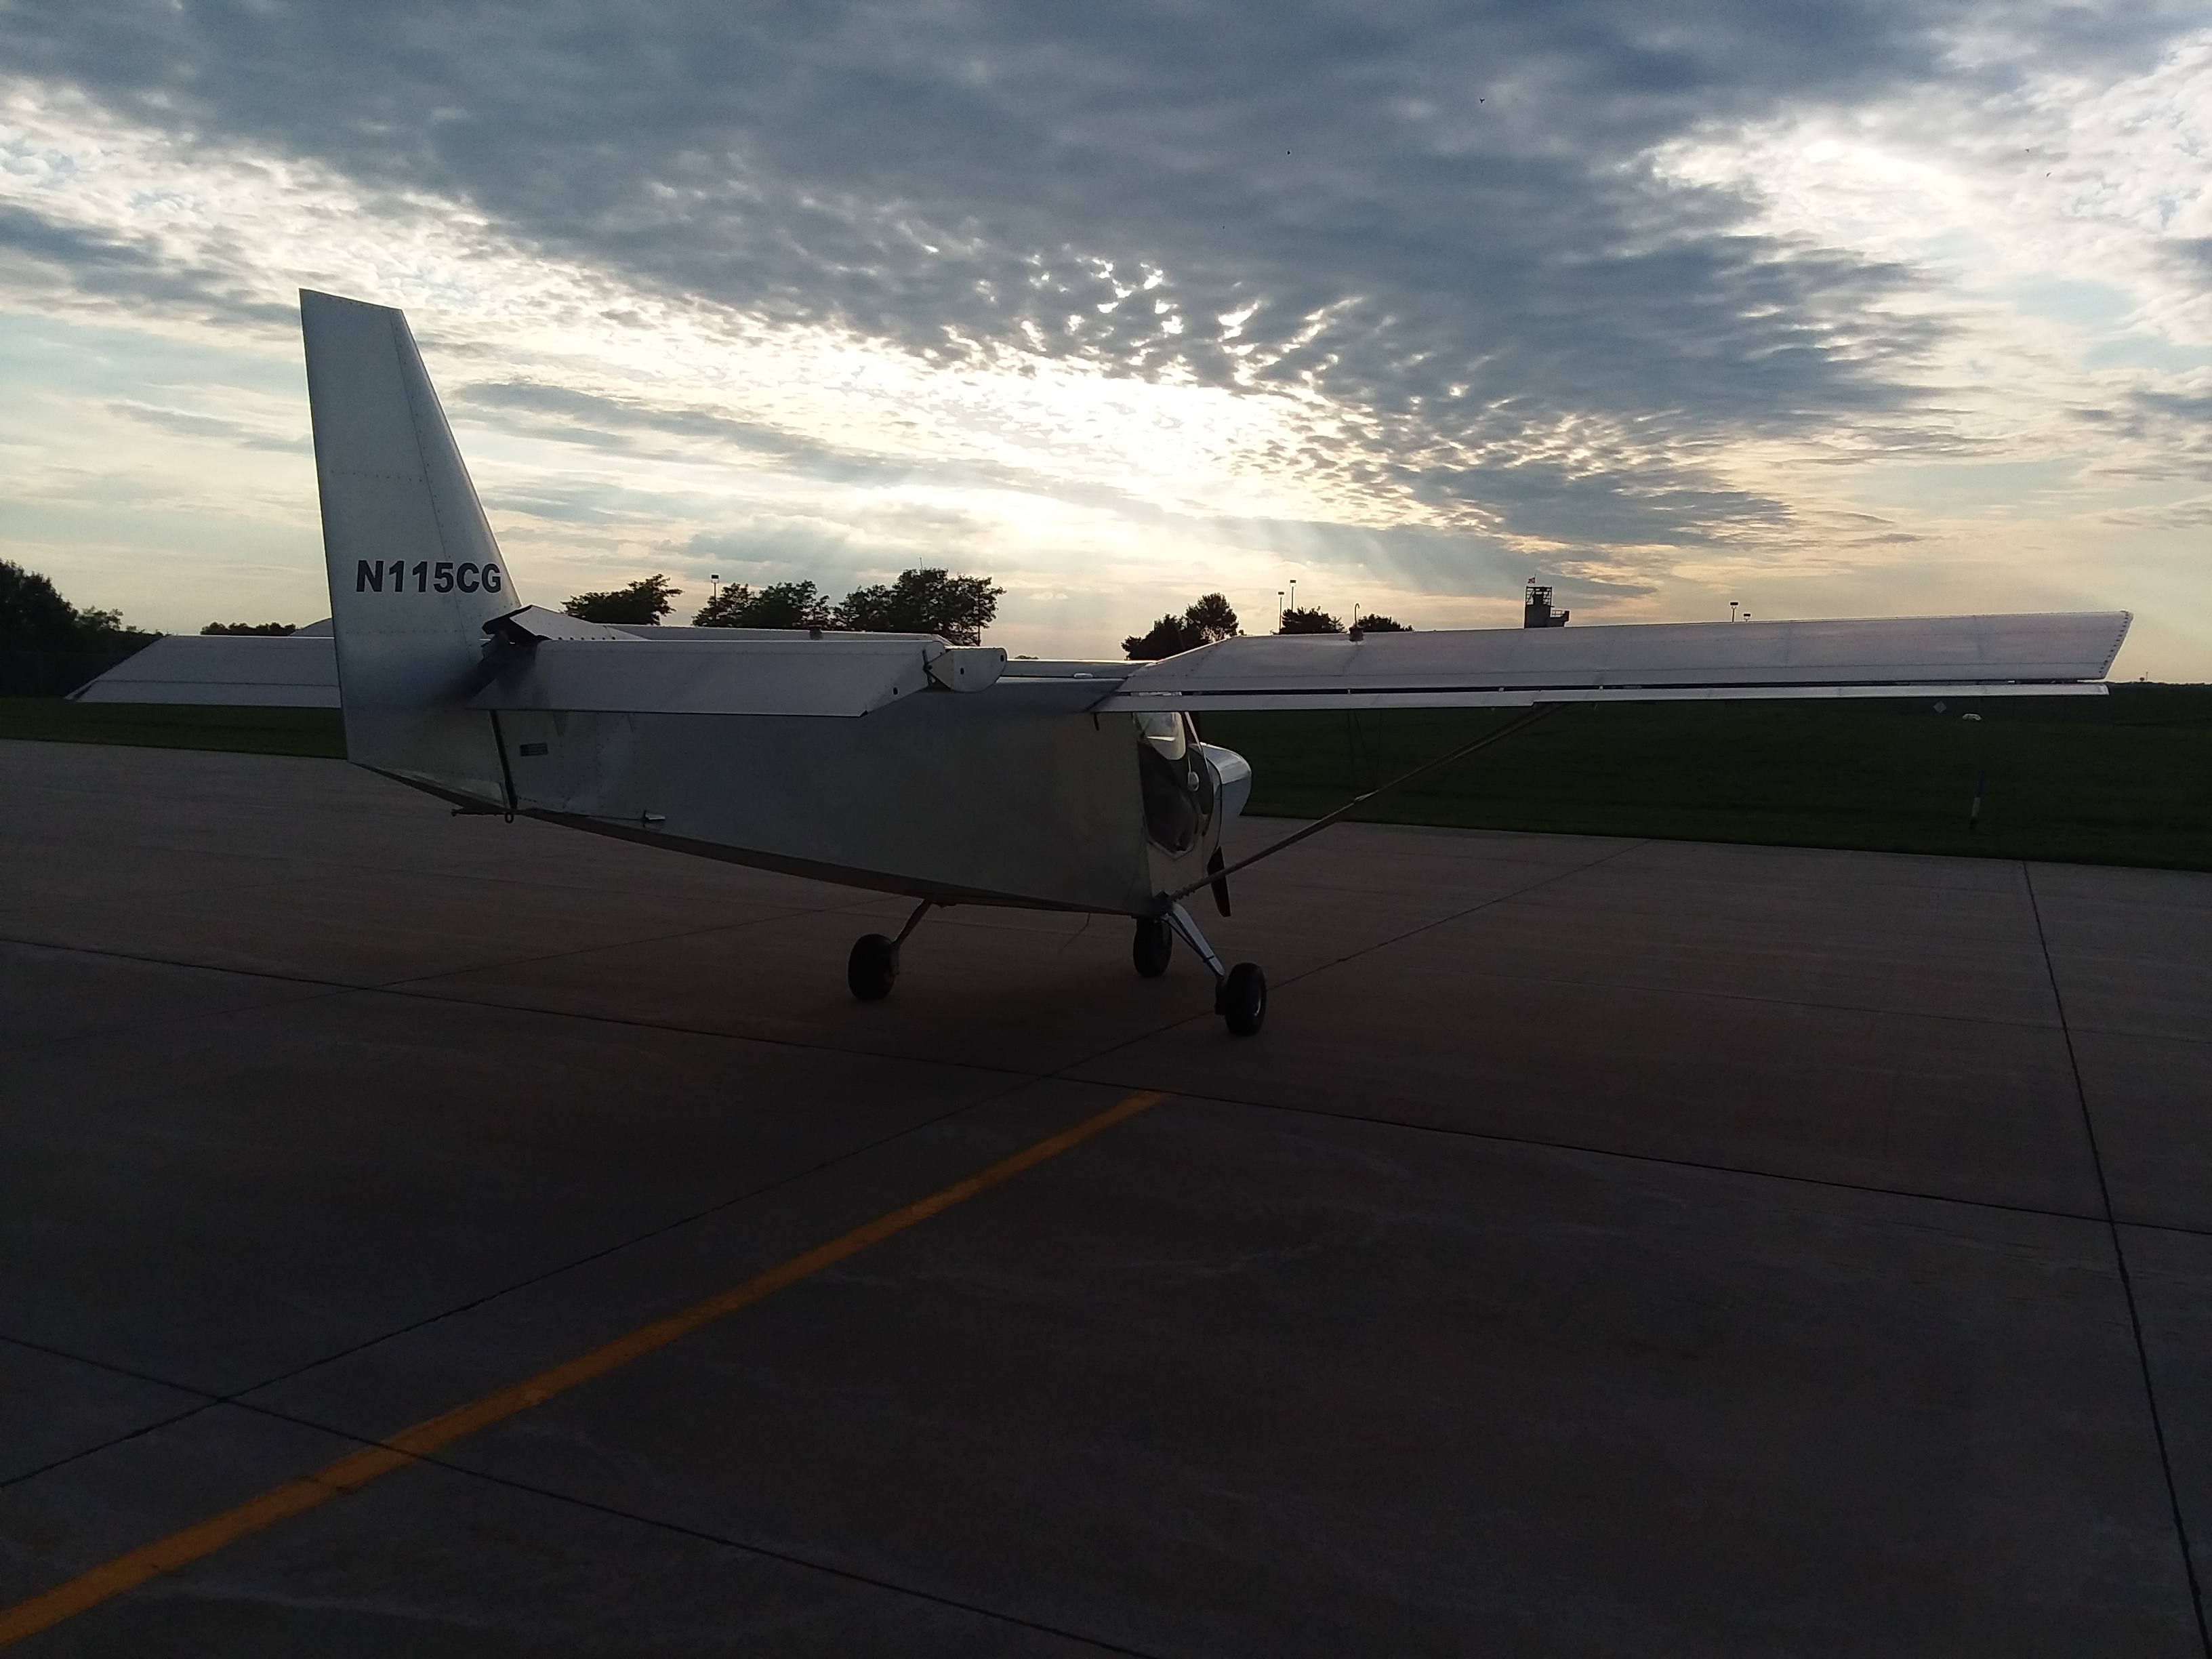 Sunset after a great flight